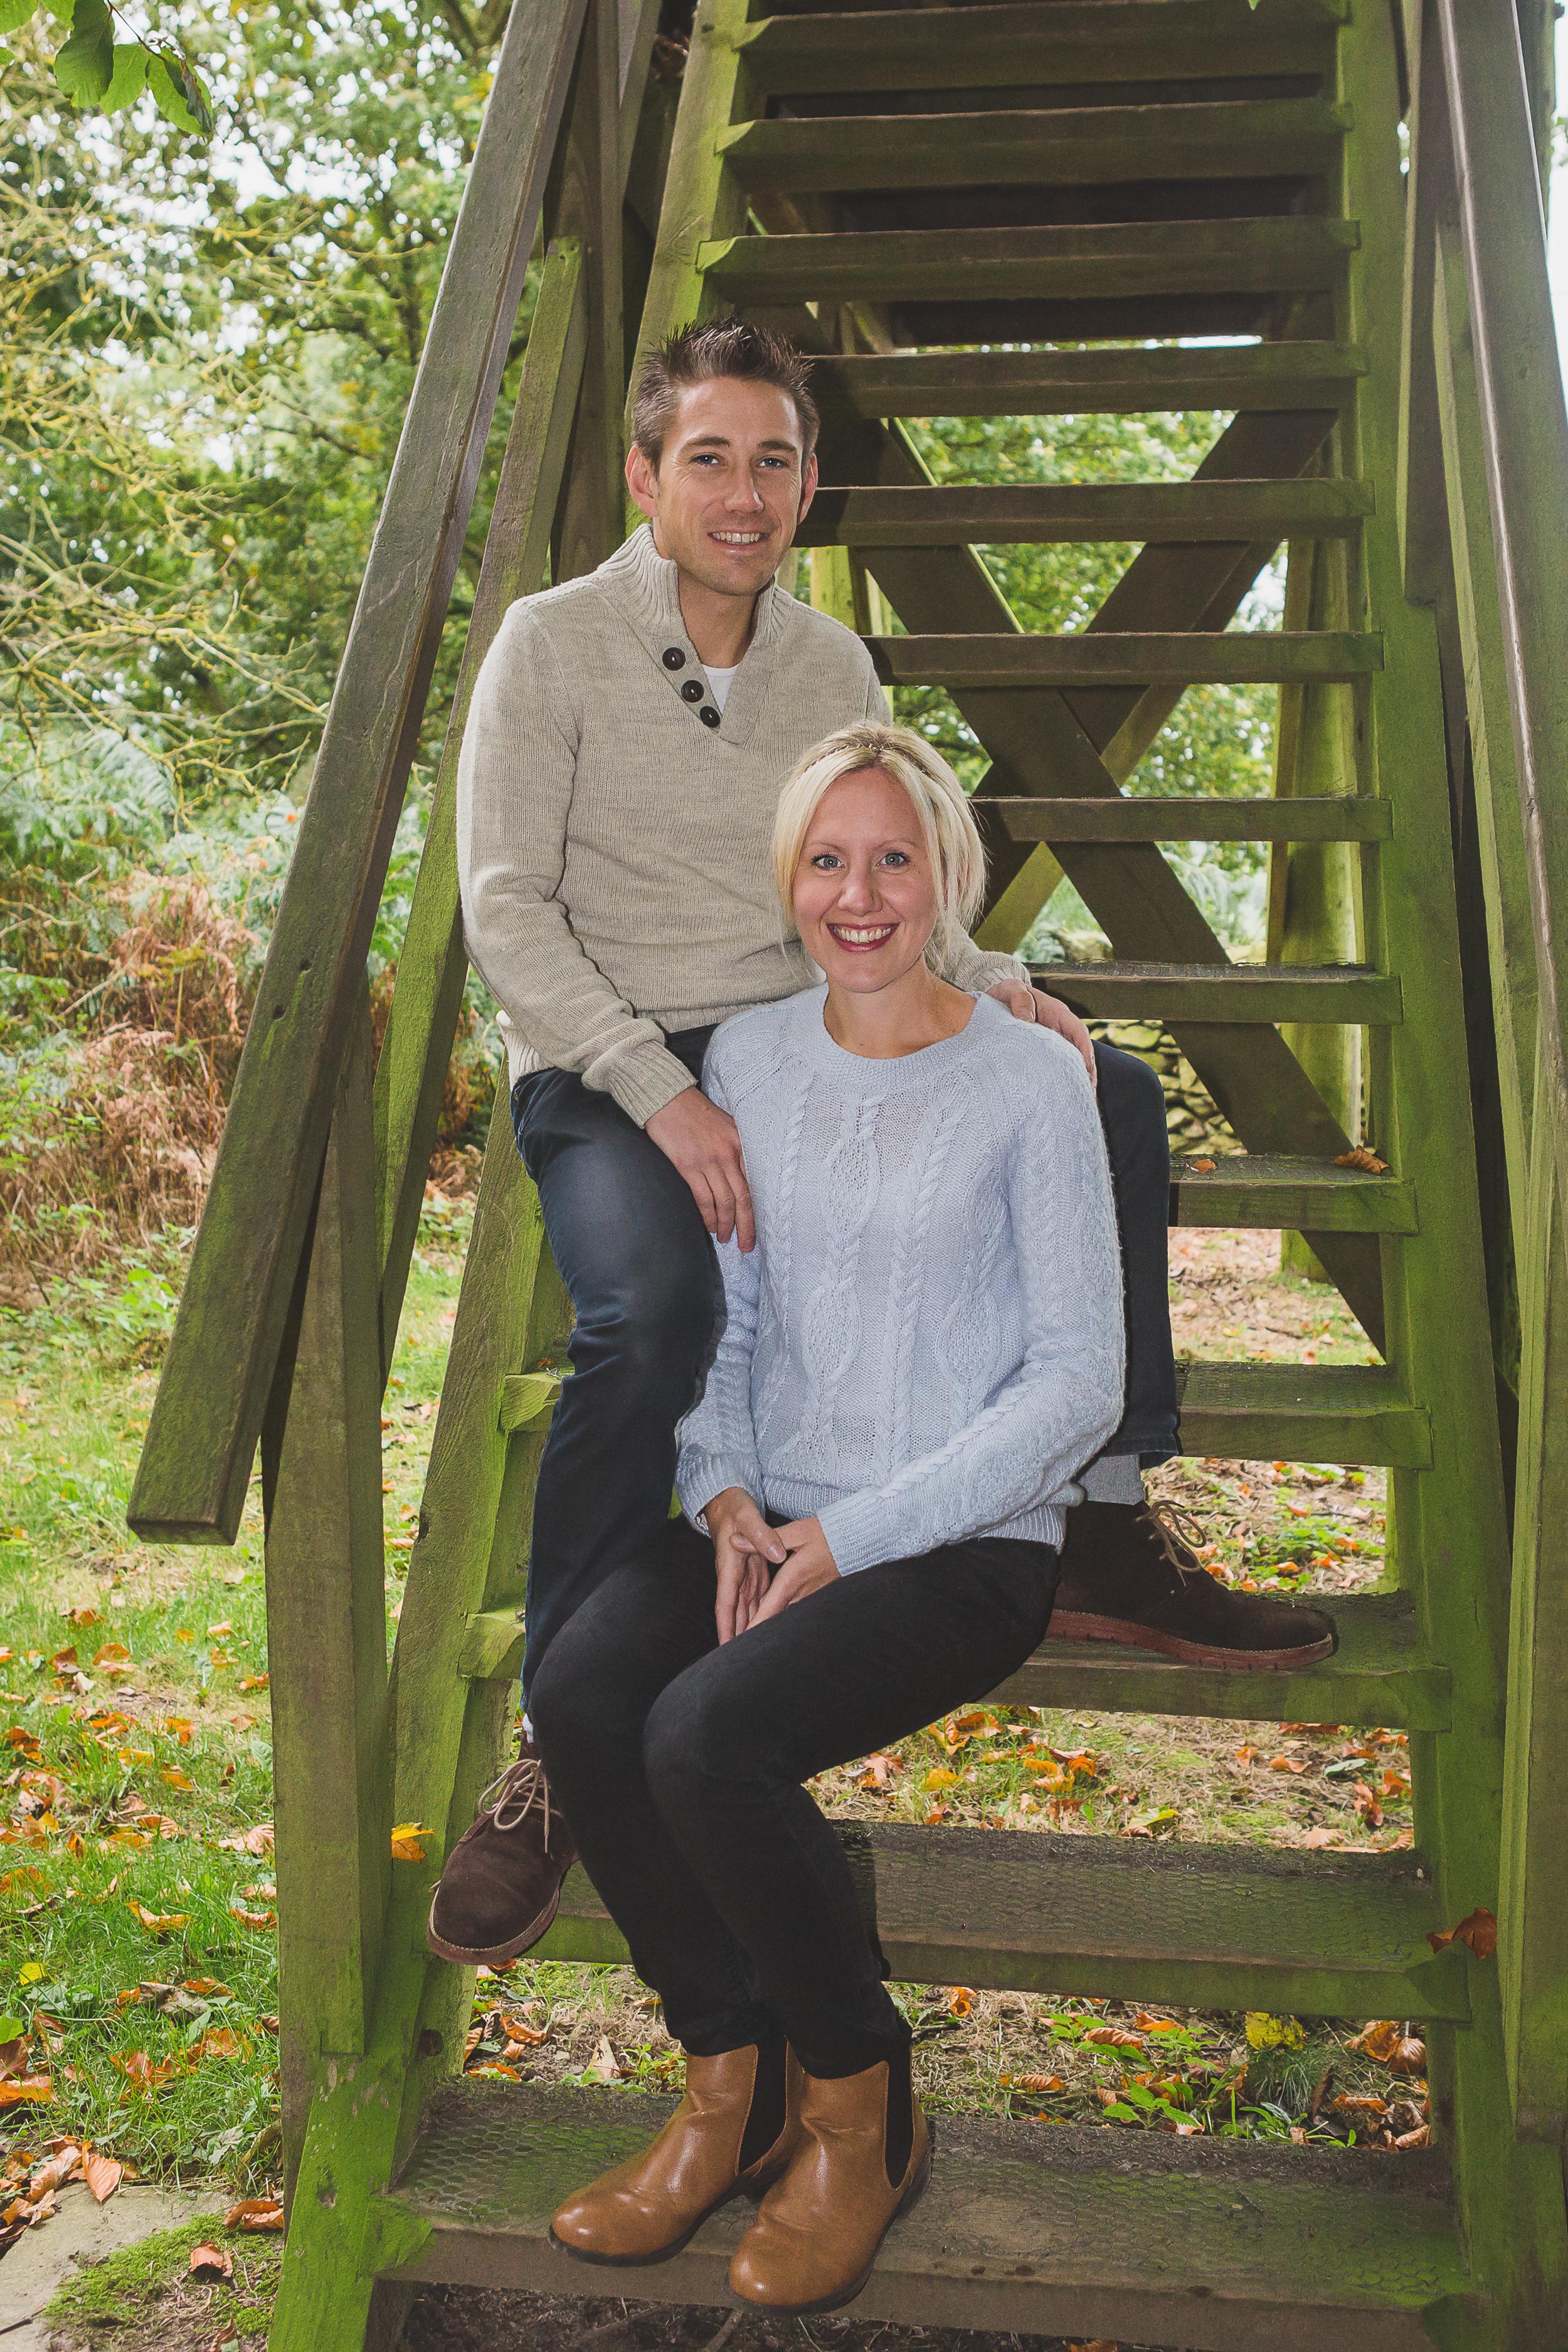 Jane-Dave-Engagement_Shoot-Beacon-Hill-Charnwood-Weddings1001.JPG